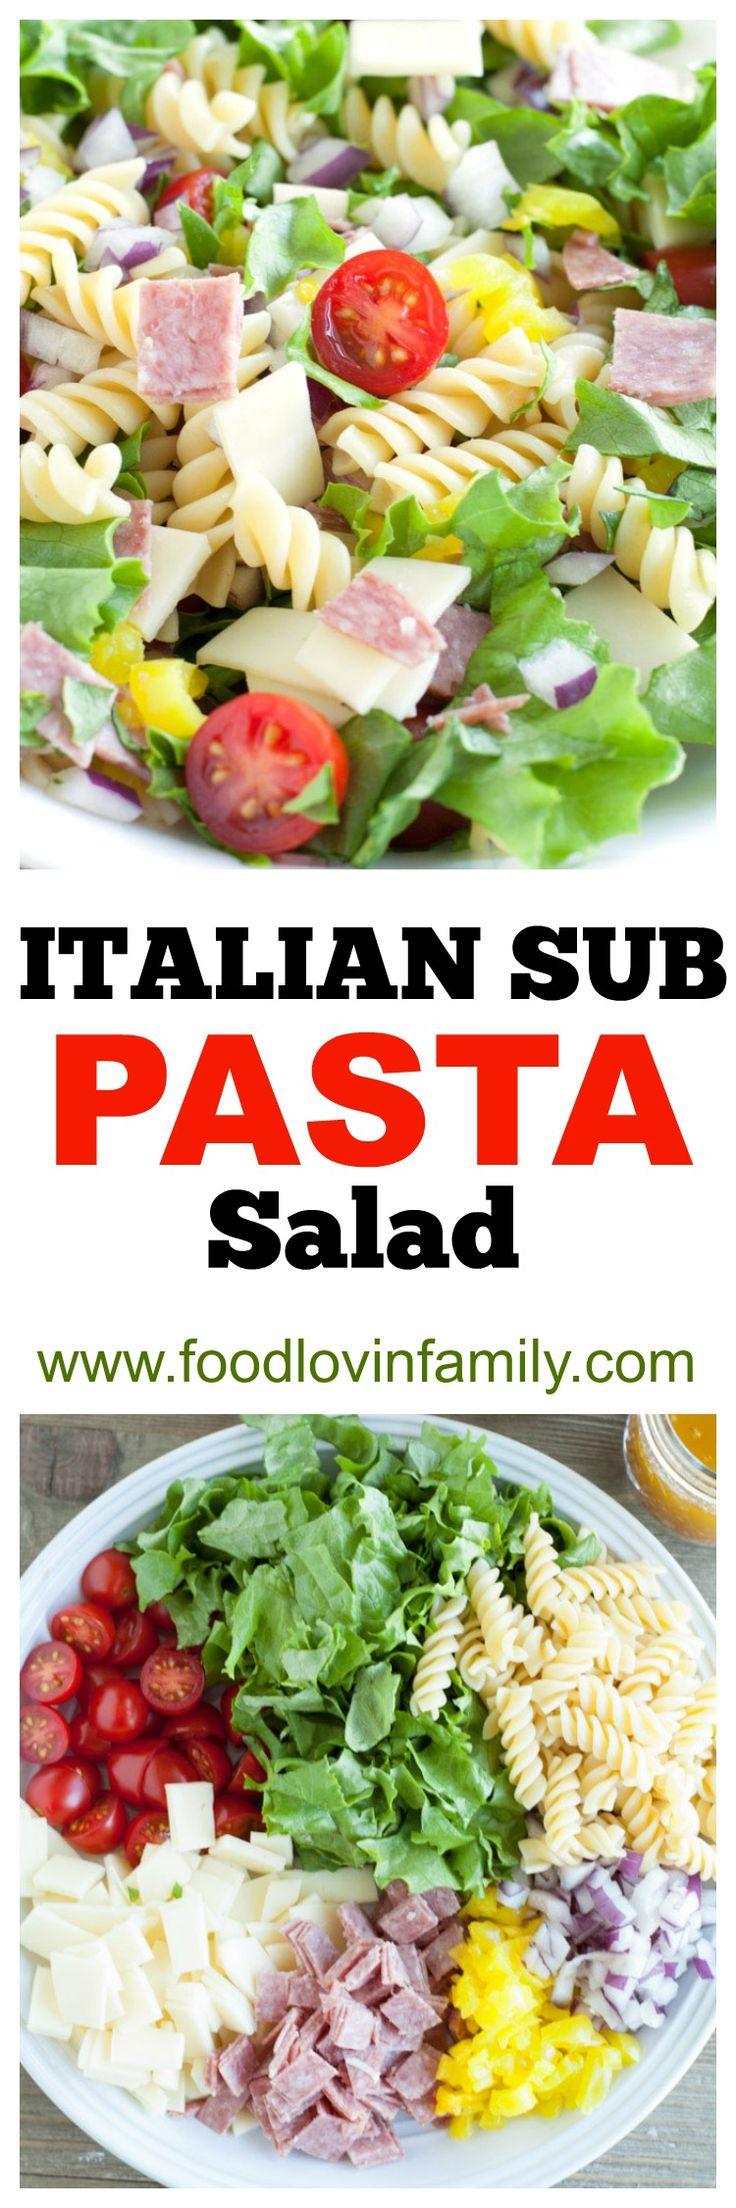 Italian Sub Pasta Salad  Pasta Salad  Italian Pasta Salad  Pot Luck  Salad 